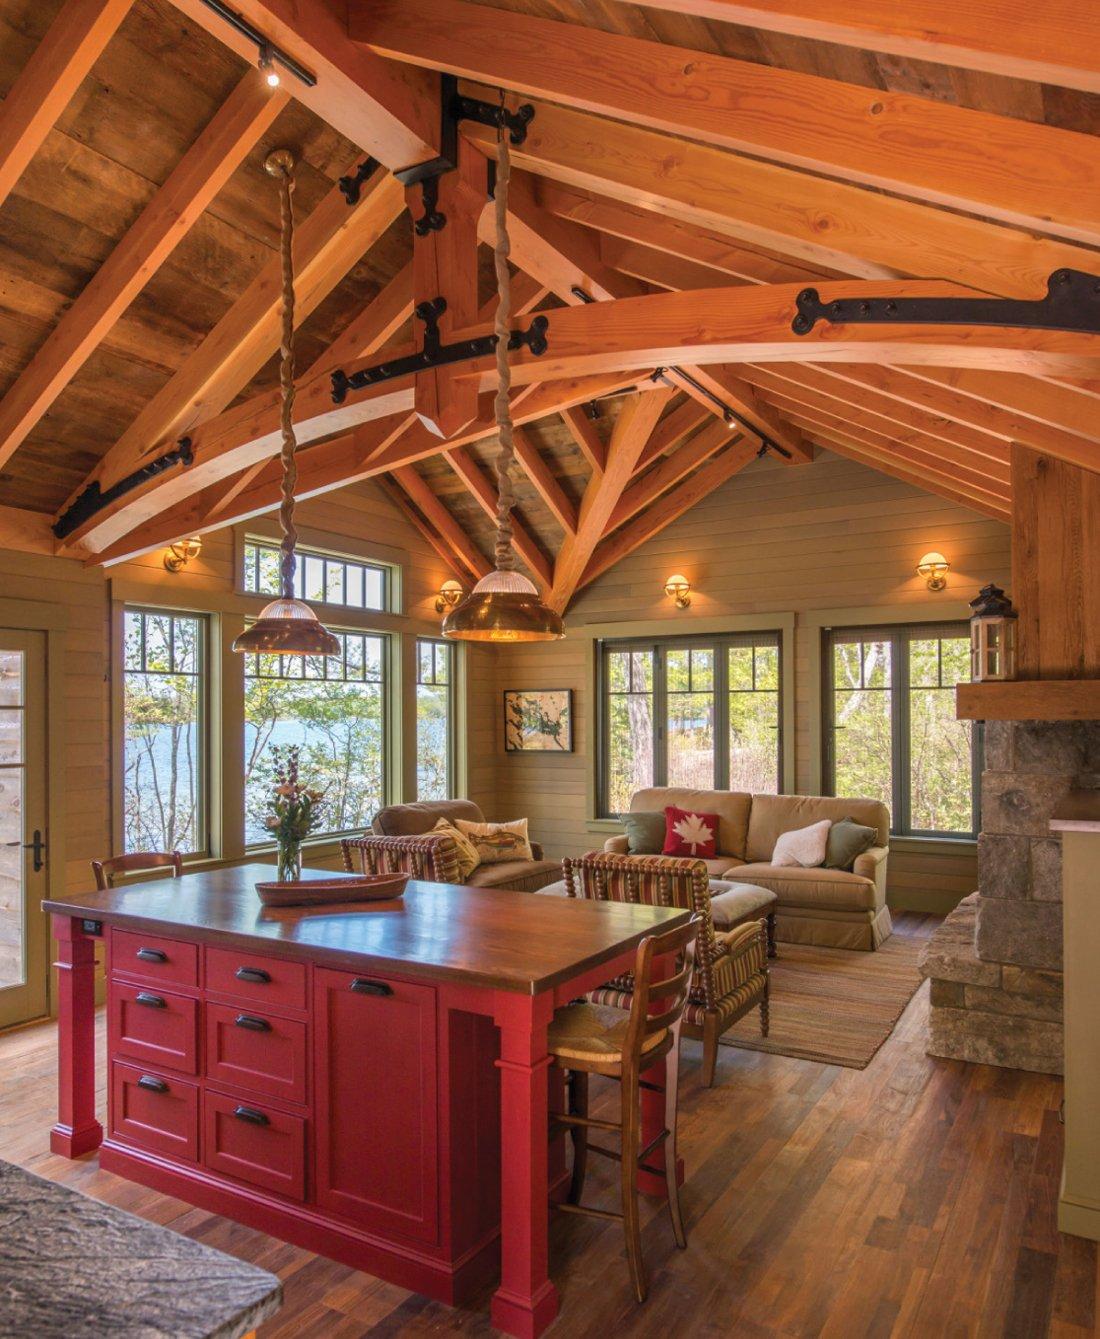 2018 Excellence In Small Home Design Winner: Winnipesaukee